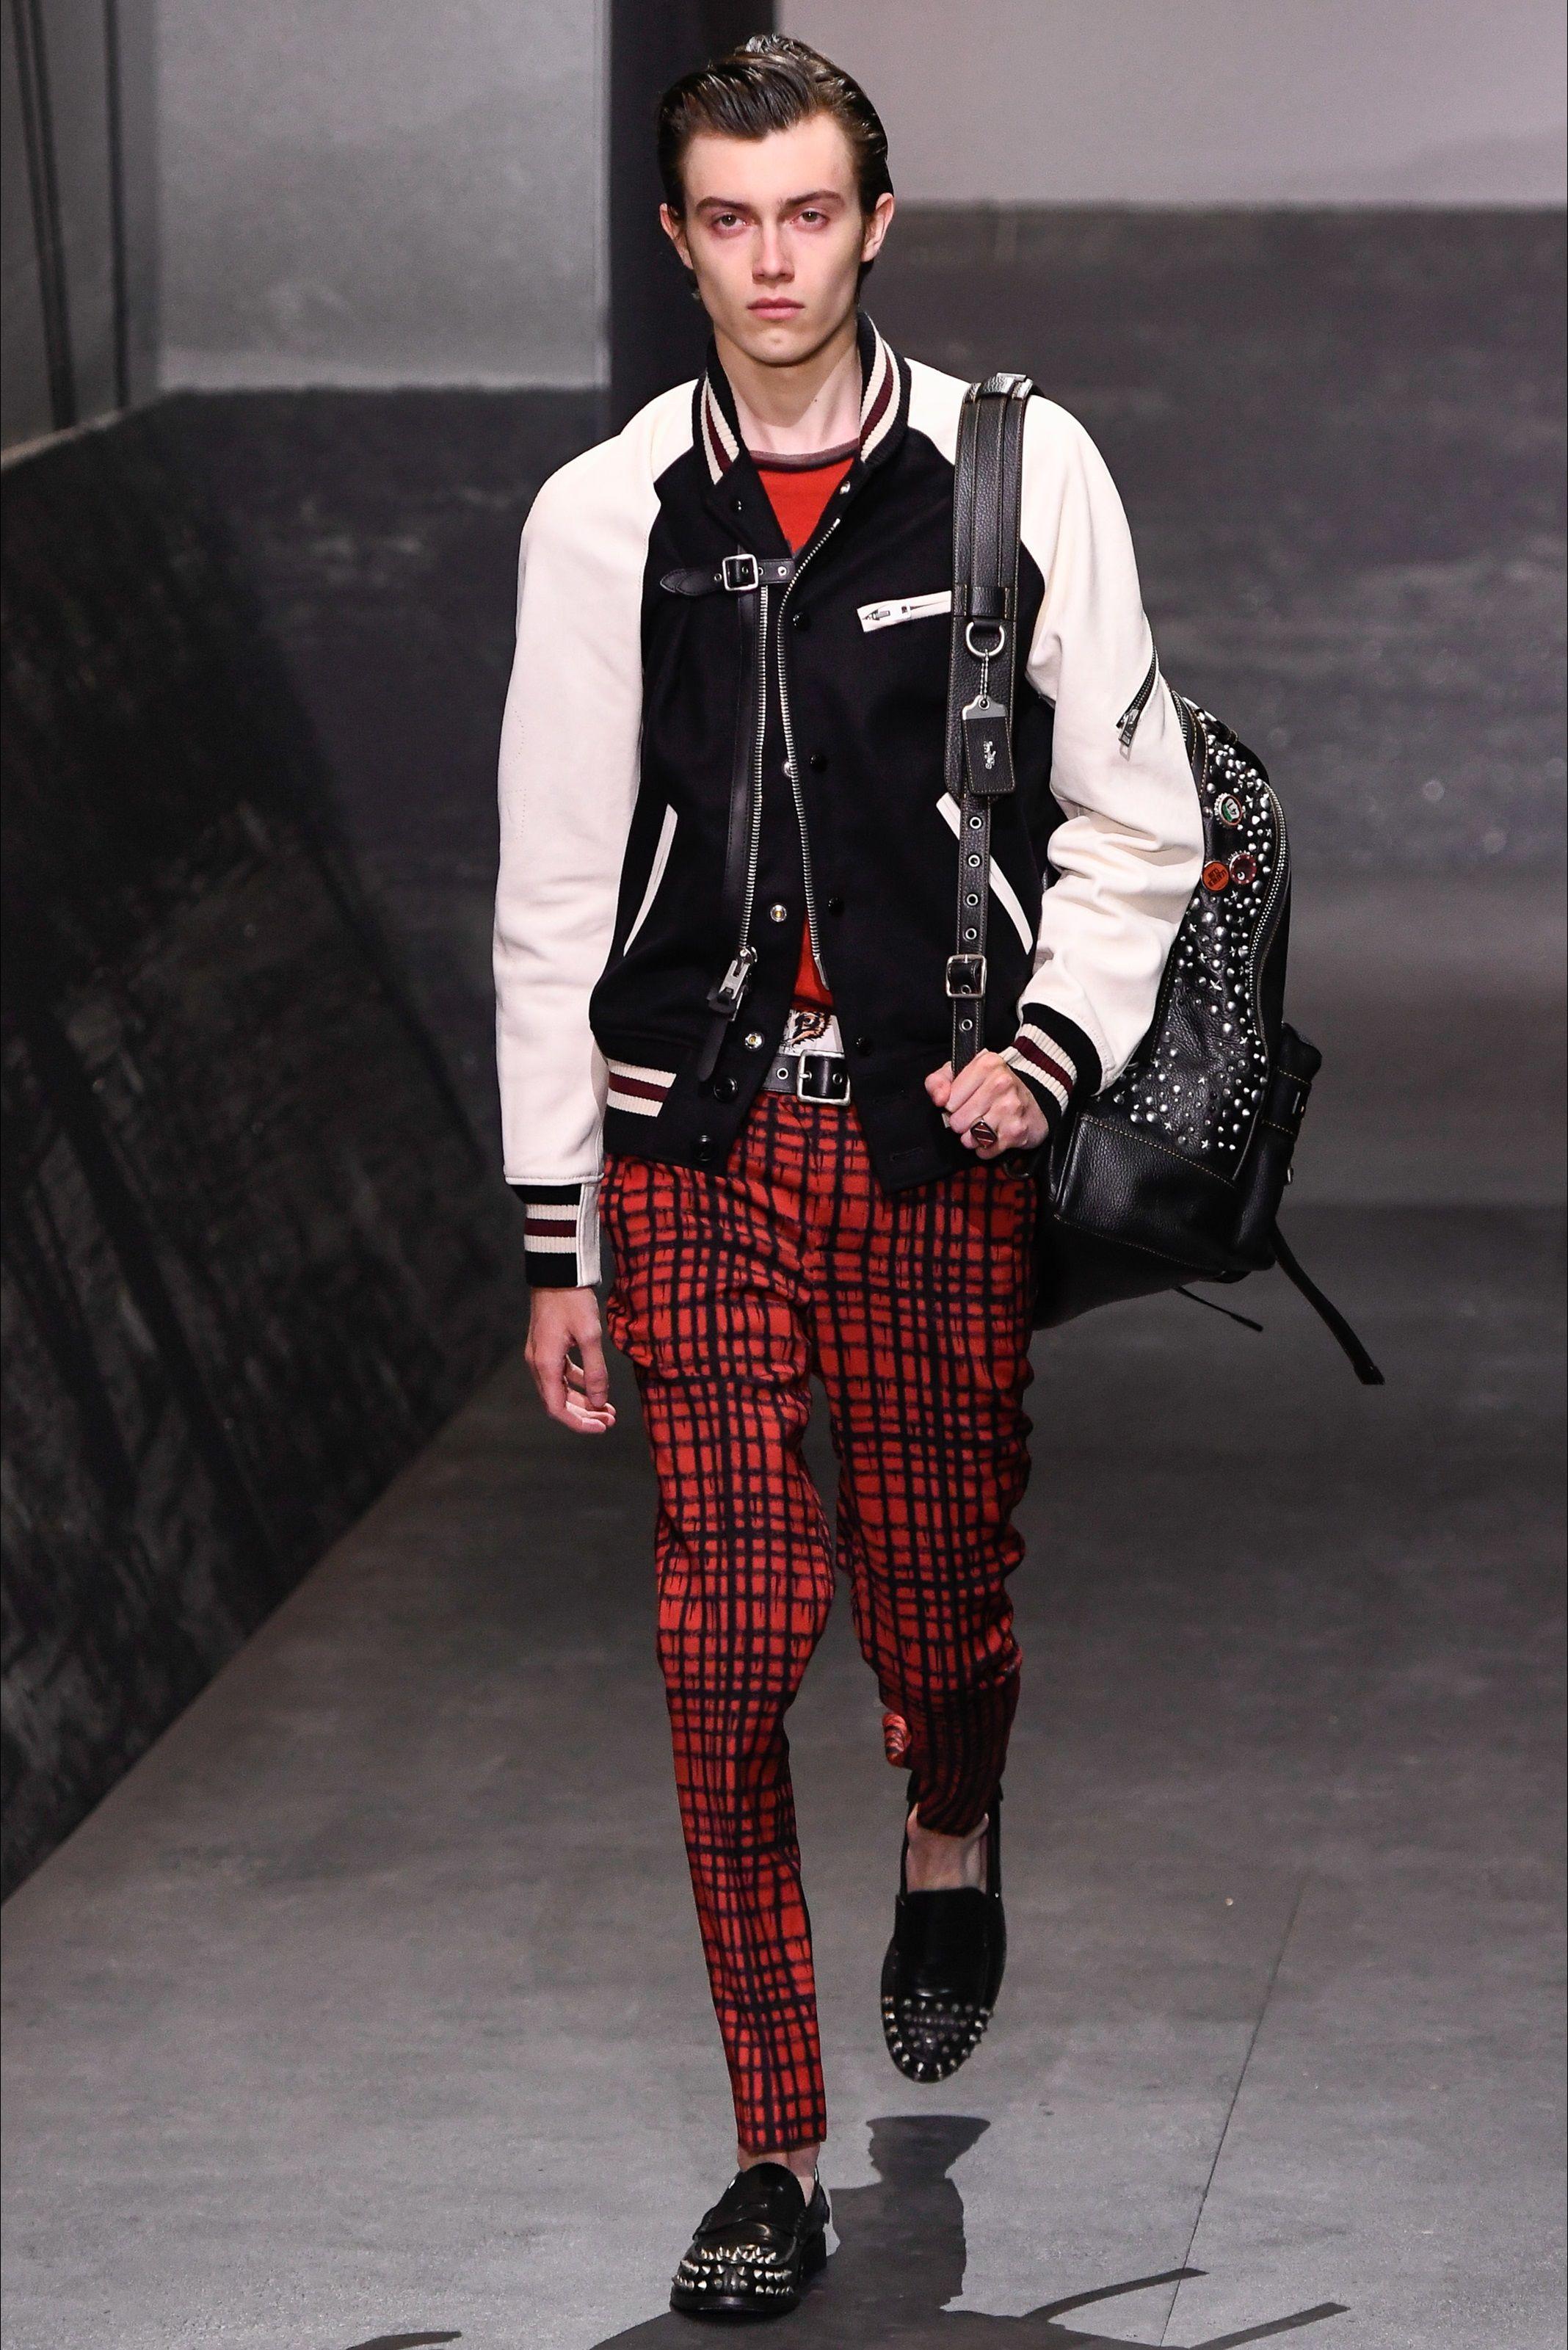 Sfilata Moda Uomo Coach 1941 Londra - Primavera Estate 2017 - Vogue